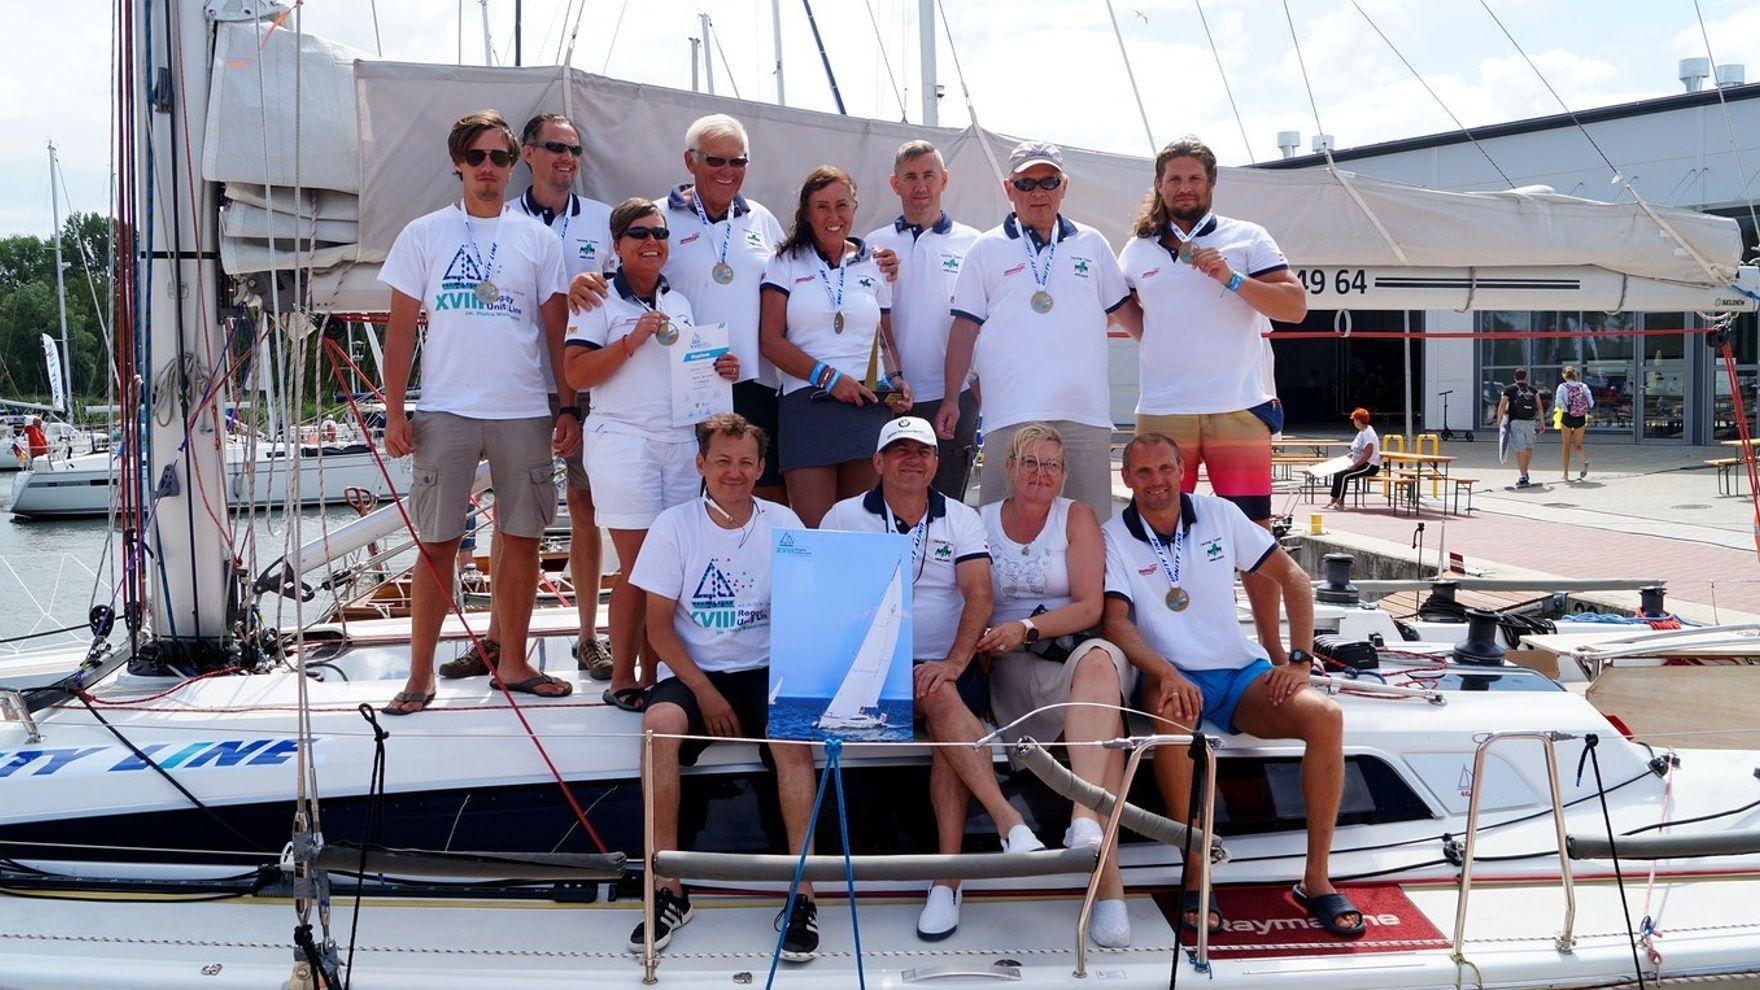 Unity Line regatta 2020